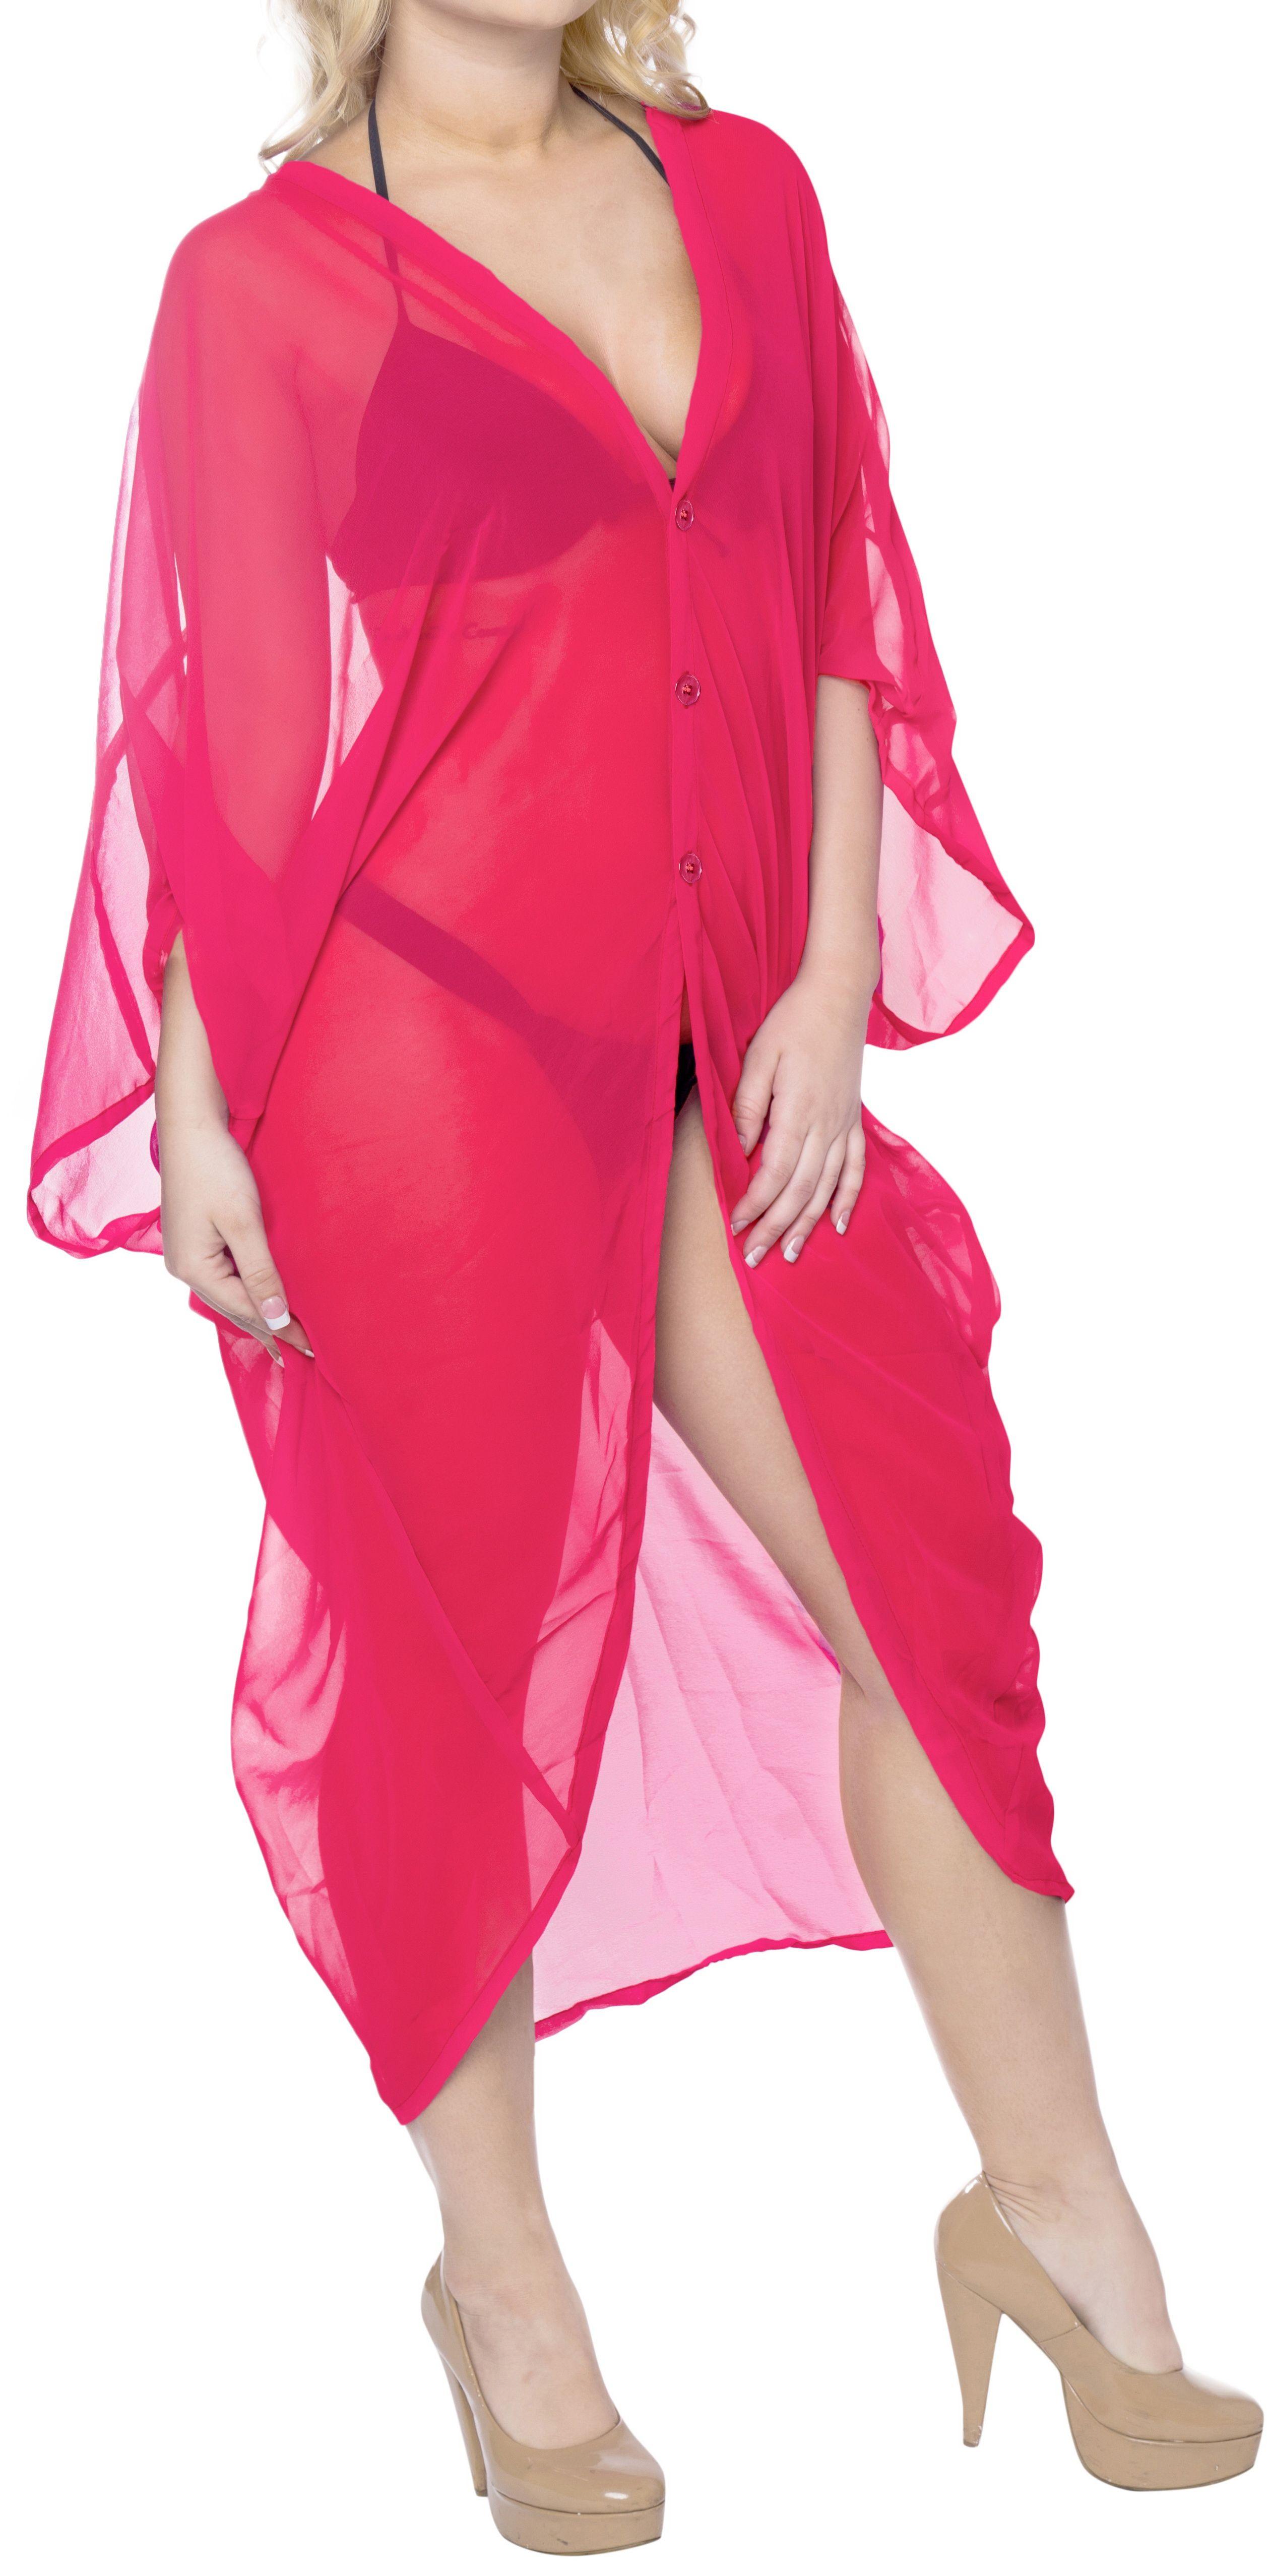 0b470ff3f1 Cardigan Women's Kimono Beachwear Swimsuit Swimwear Cover ups Kaftan Blouse  Top#Beachwear, #Swimsuit, #Kimono